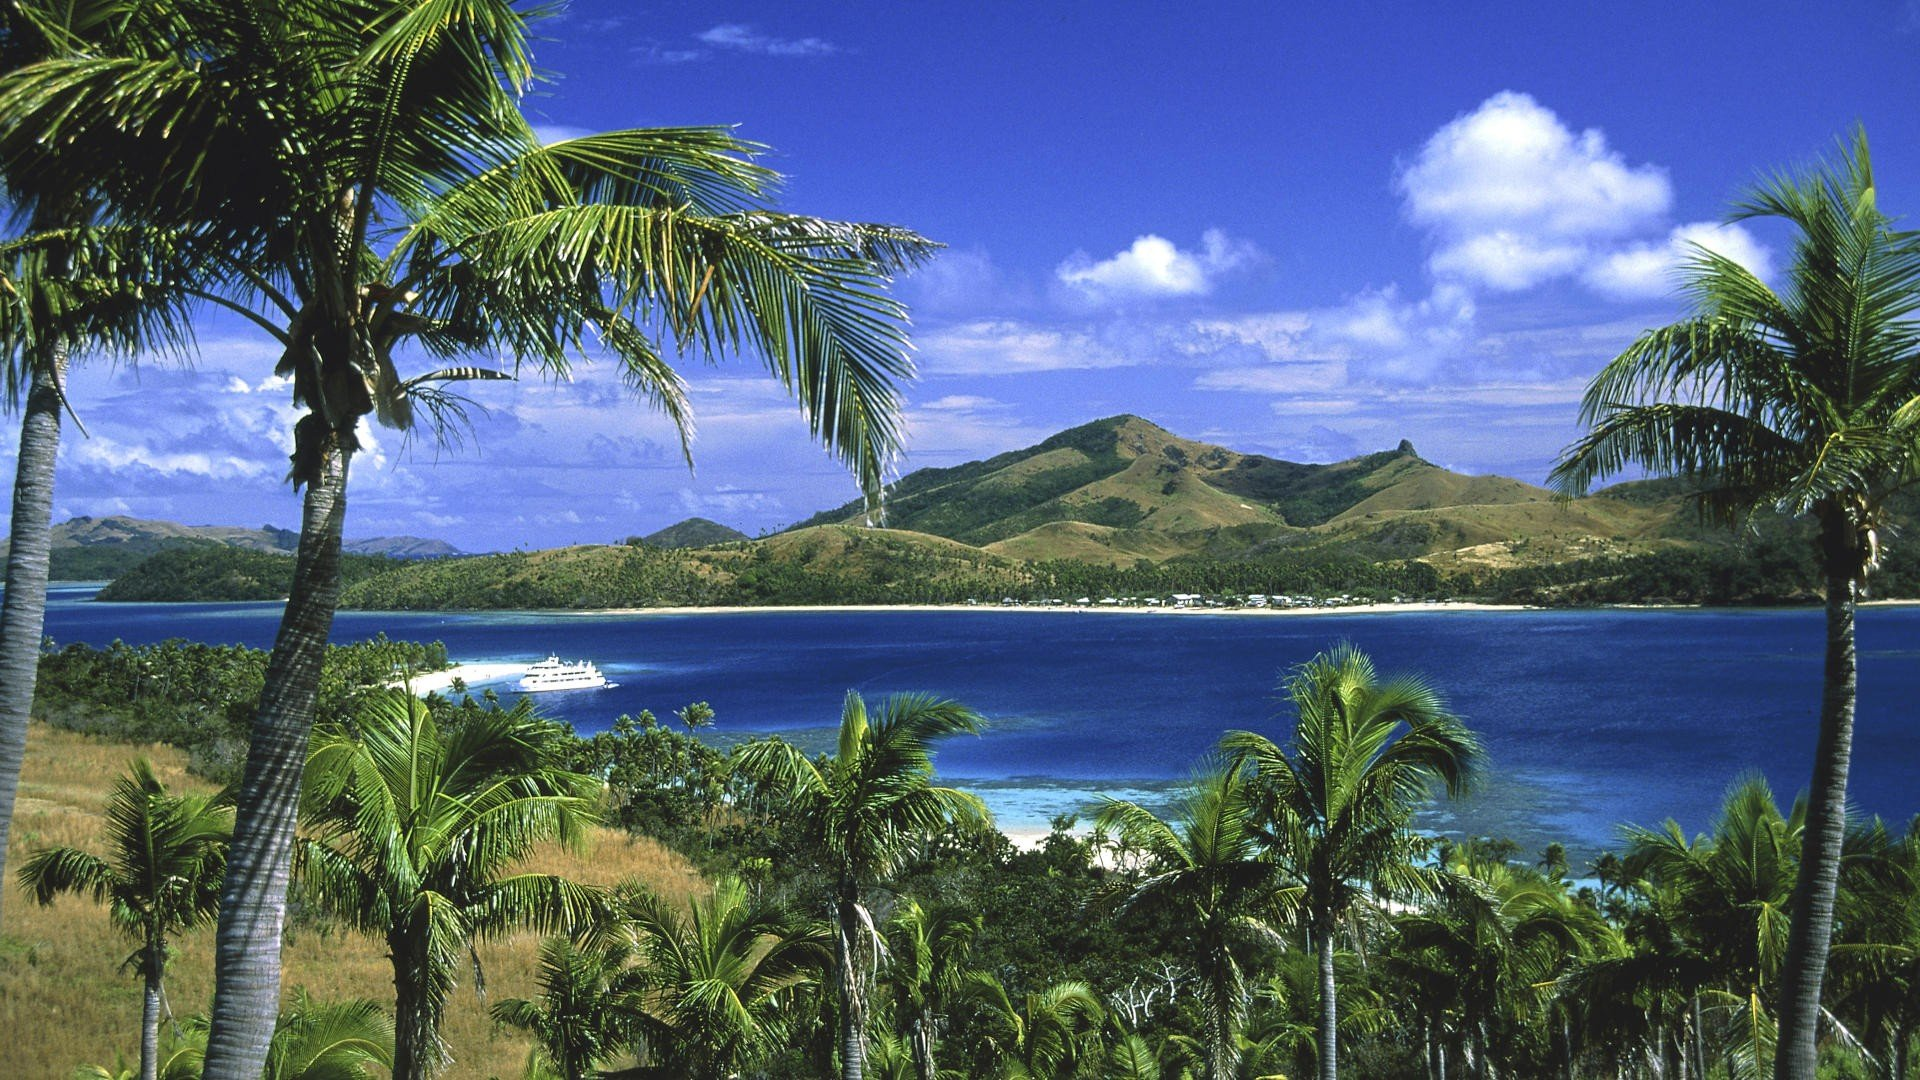 Landscapes fiji islands wallpaper 1920x1080 311322 wallpaperup - Fiji hd wallpaper ...